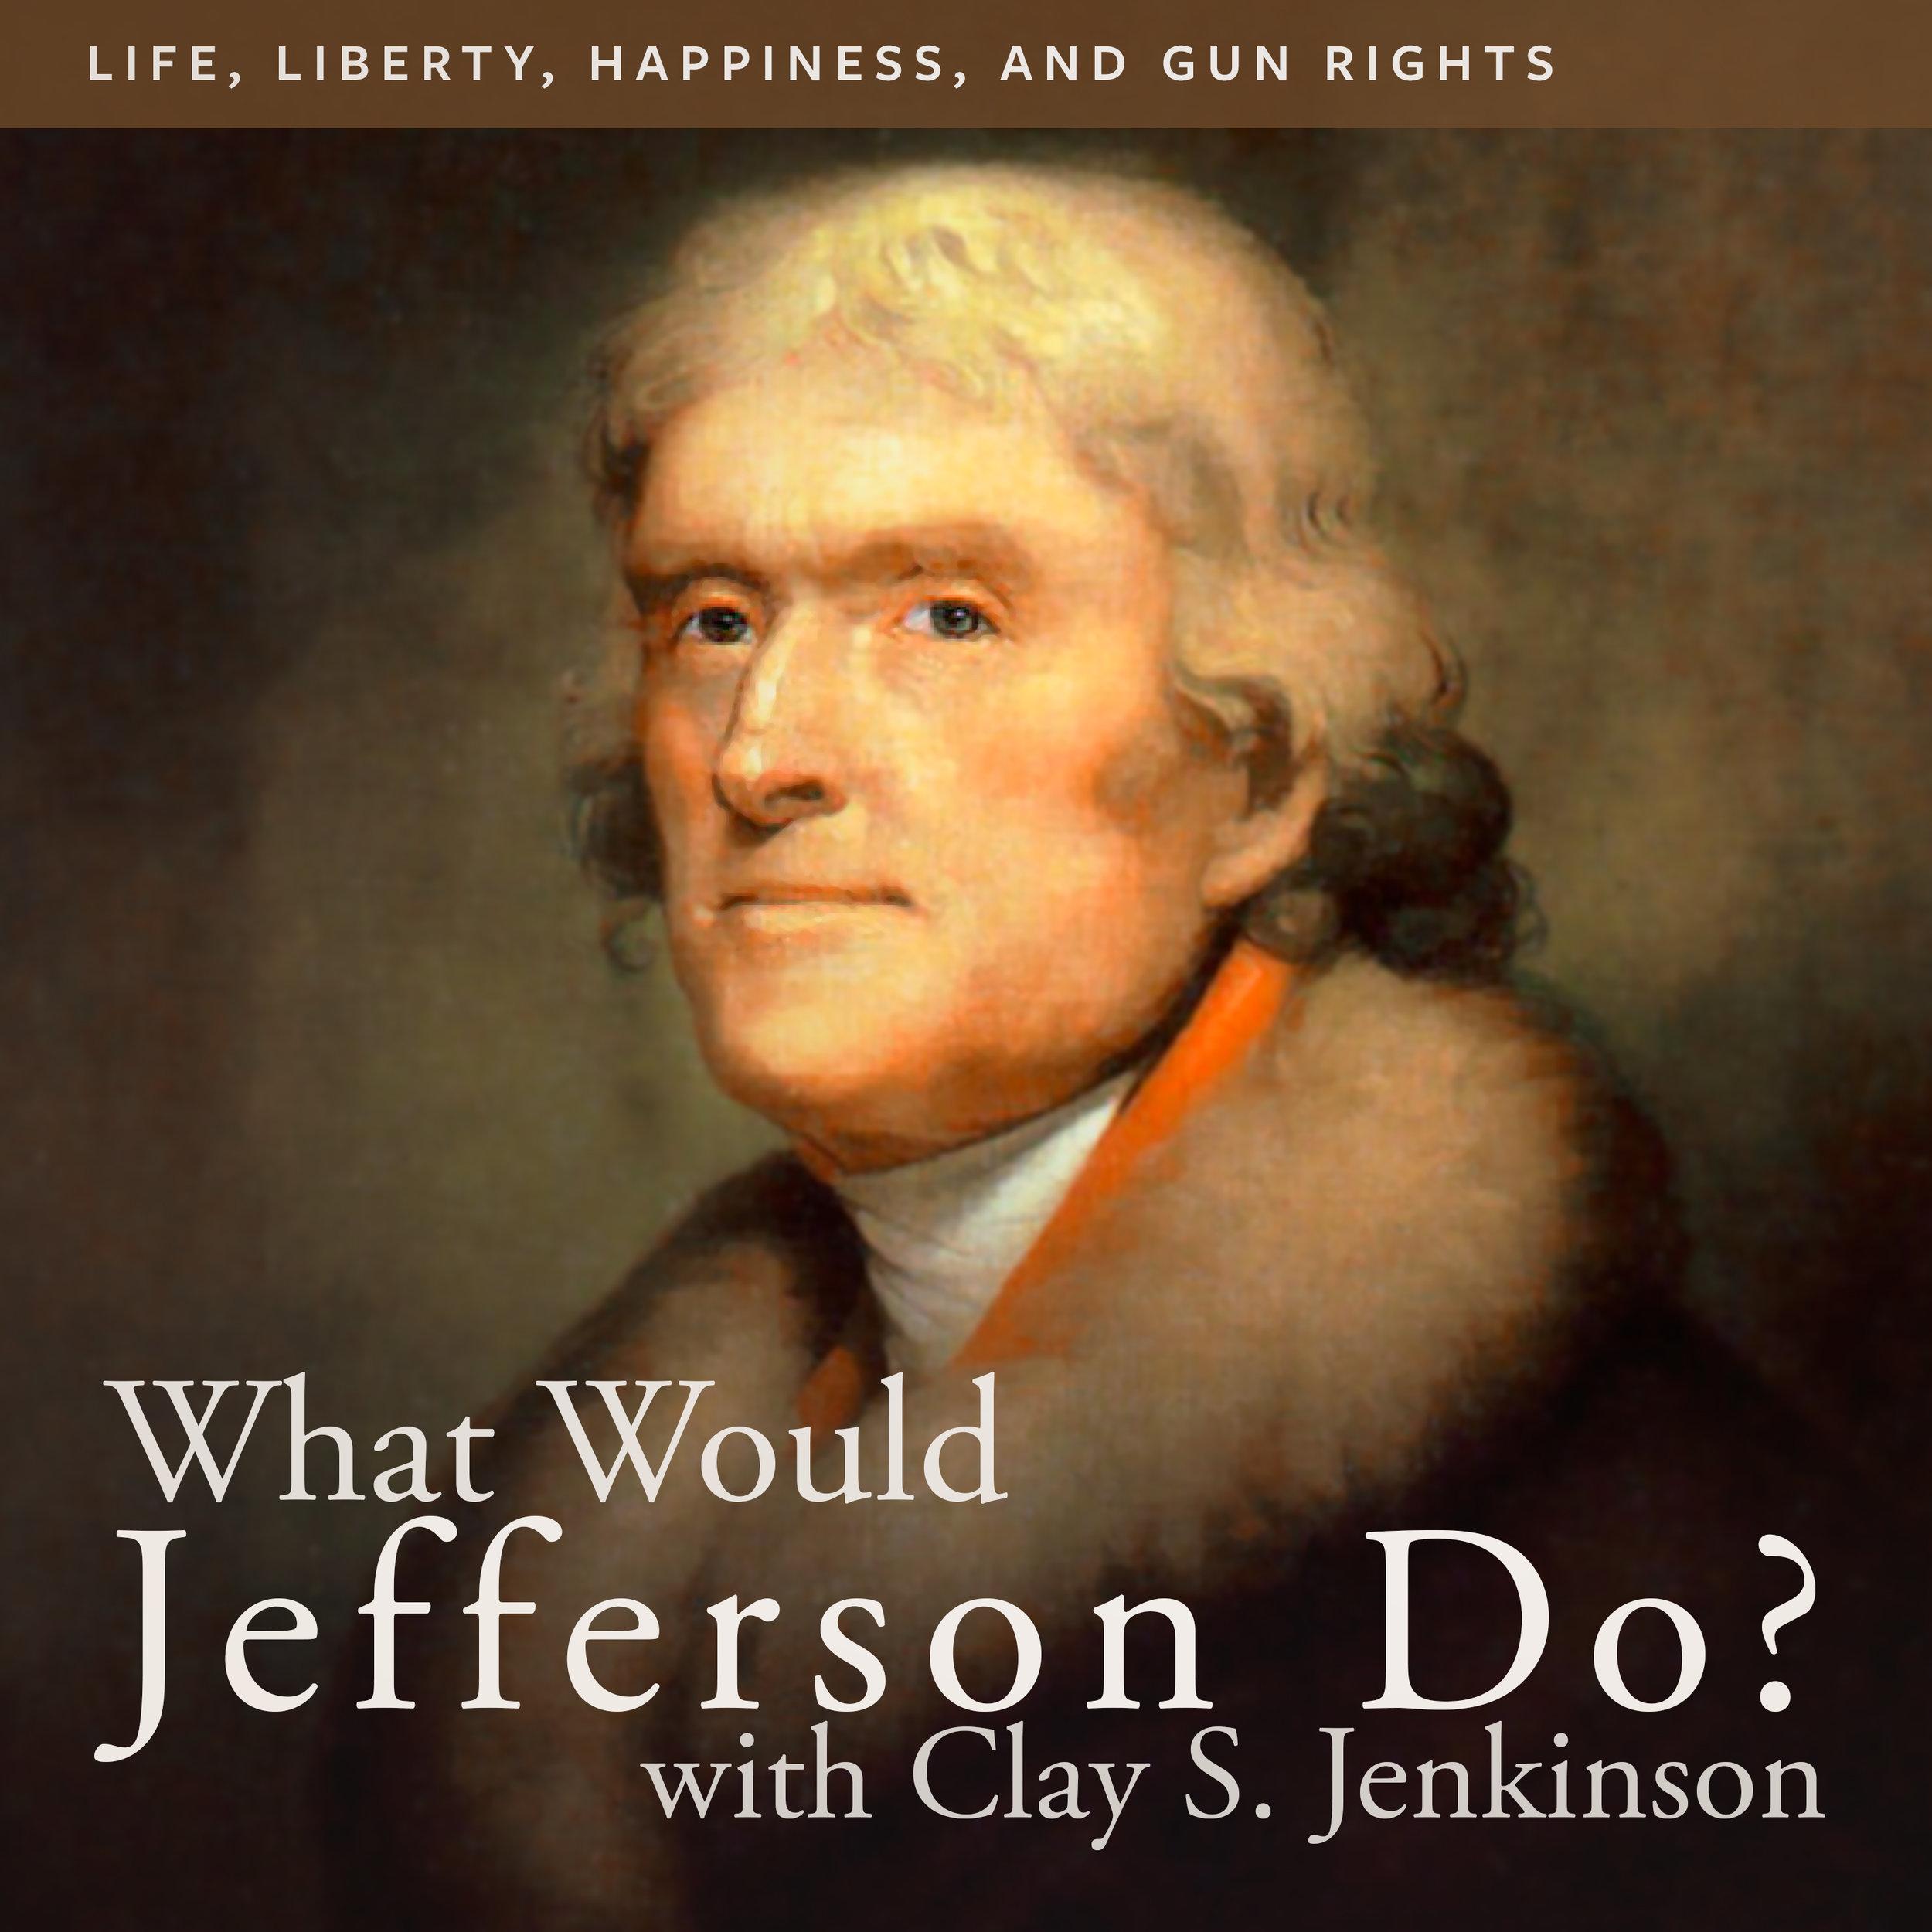 WWTJD_1275 Life, Liberty, Happiness, and Gun Rights.jpg